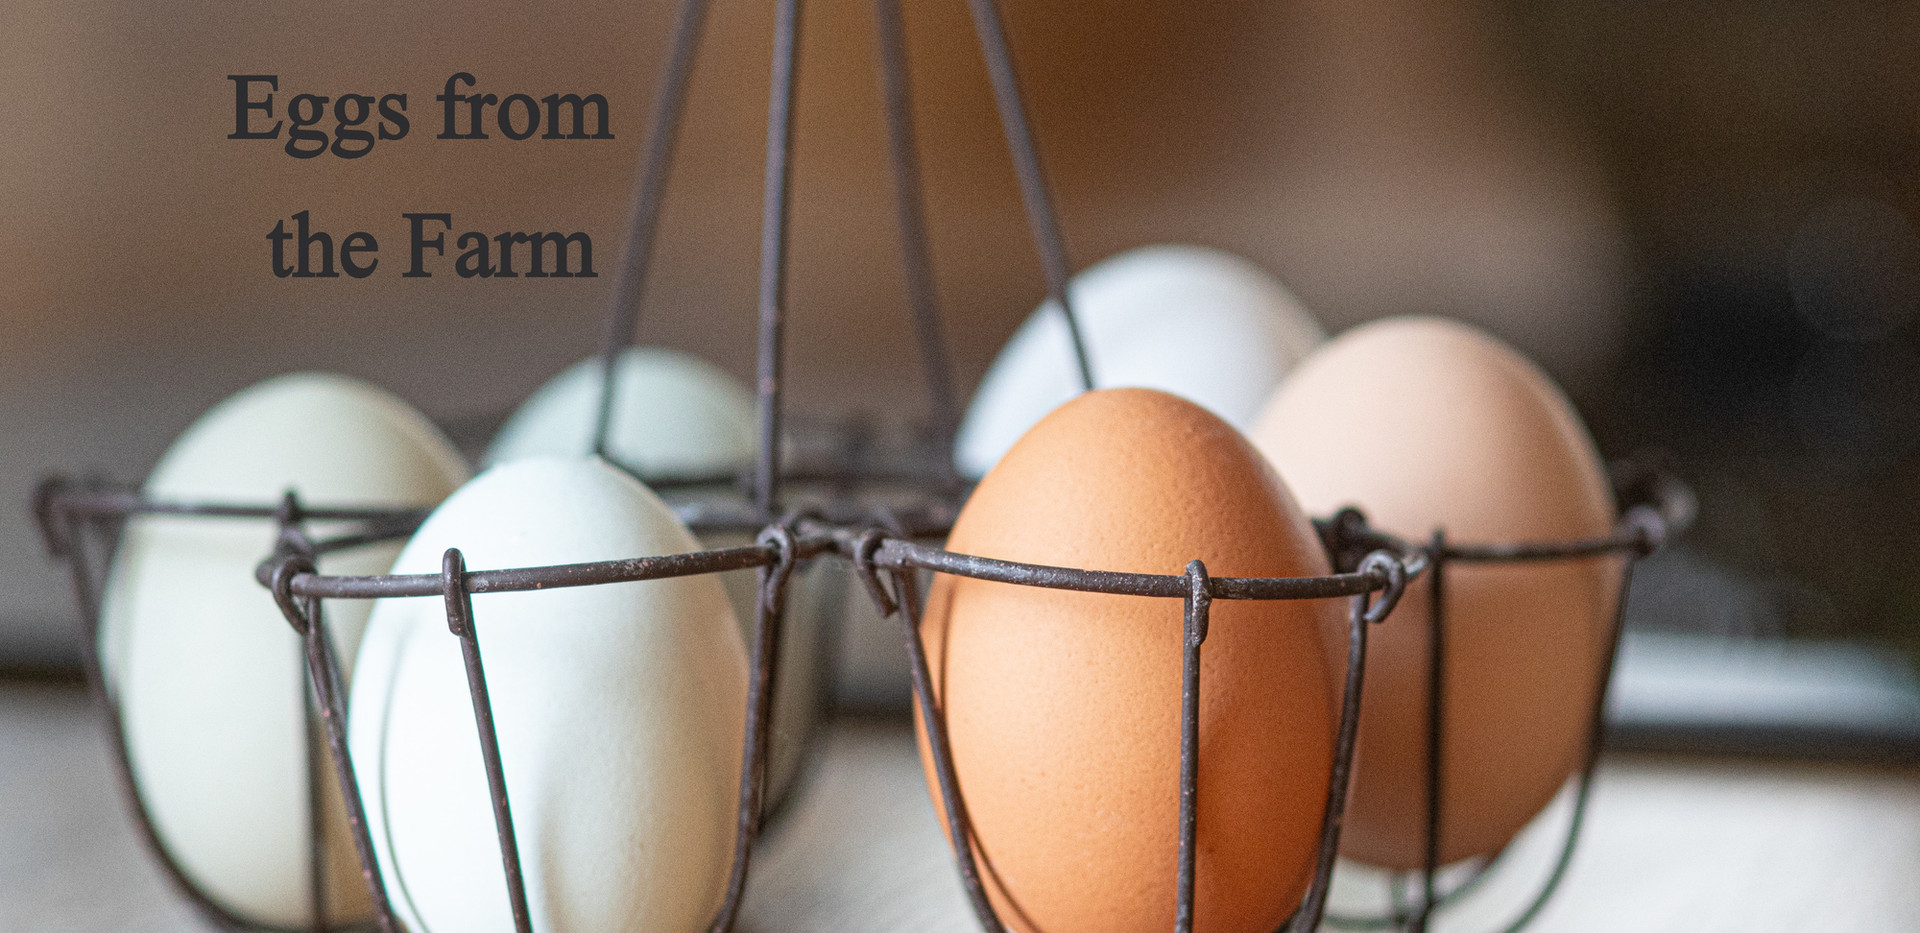 Eggs from the Farm